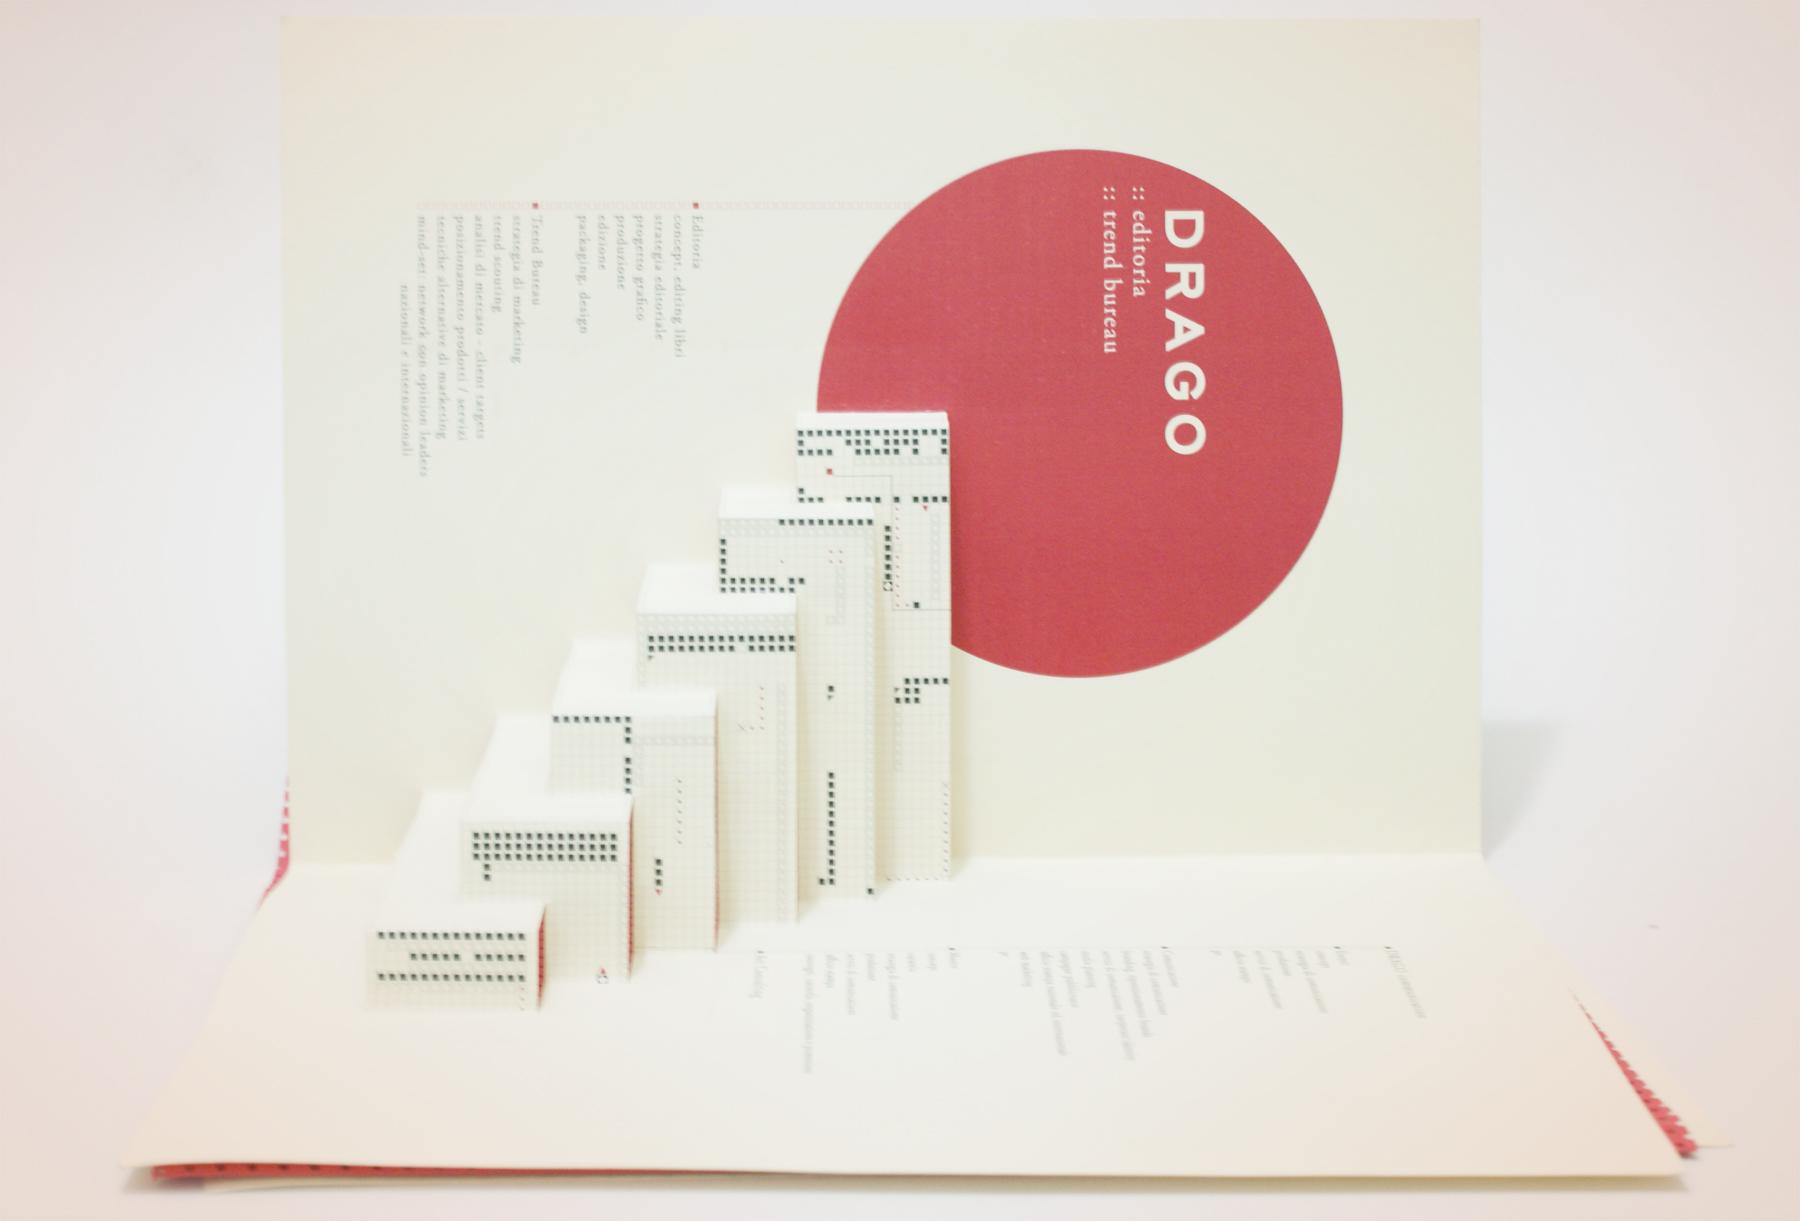 fabio-bevilacqua-drago-05